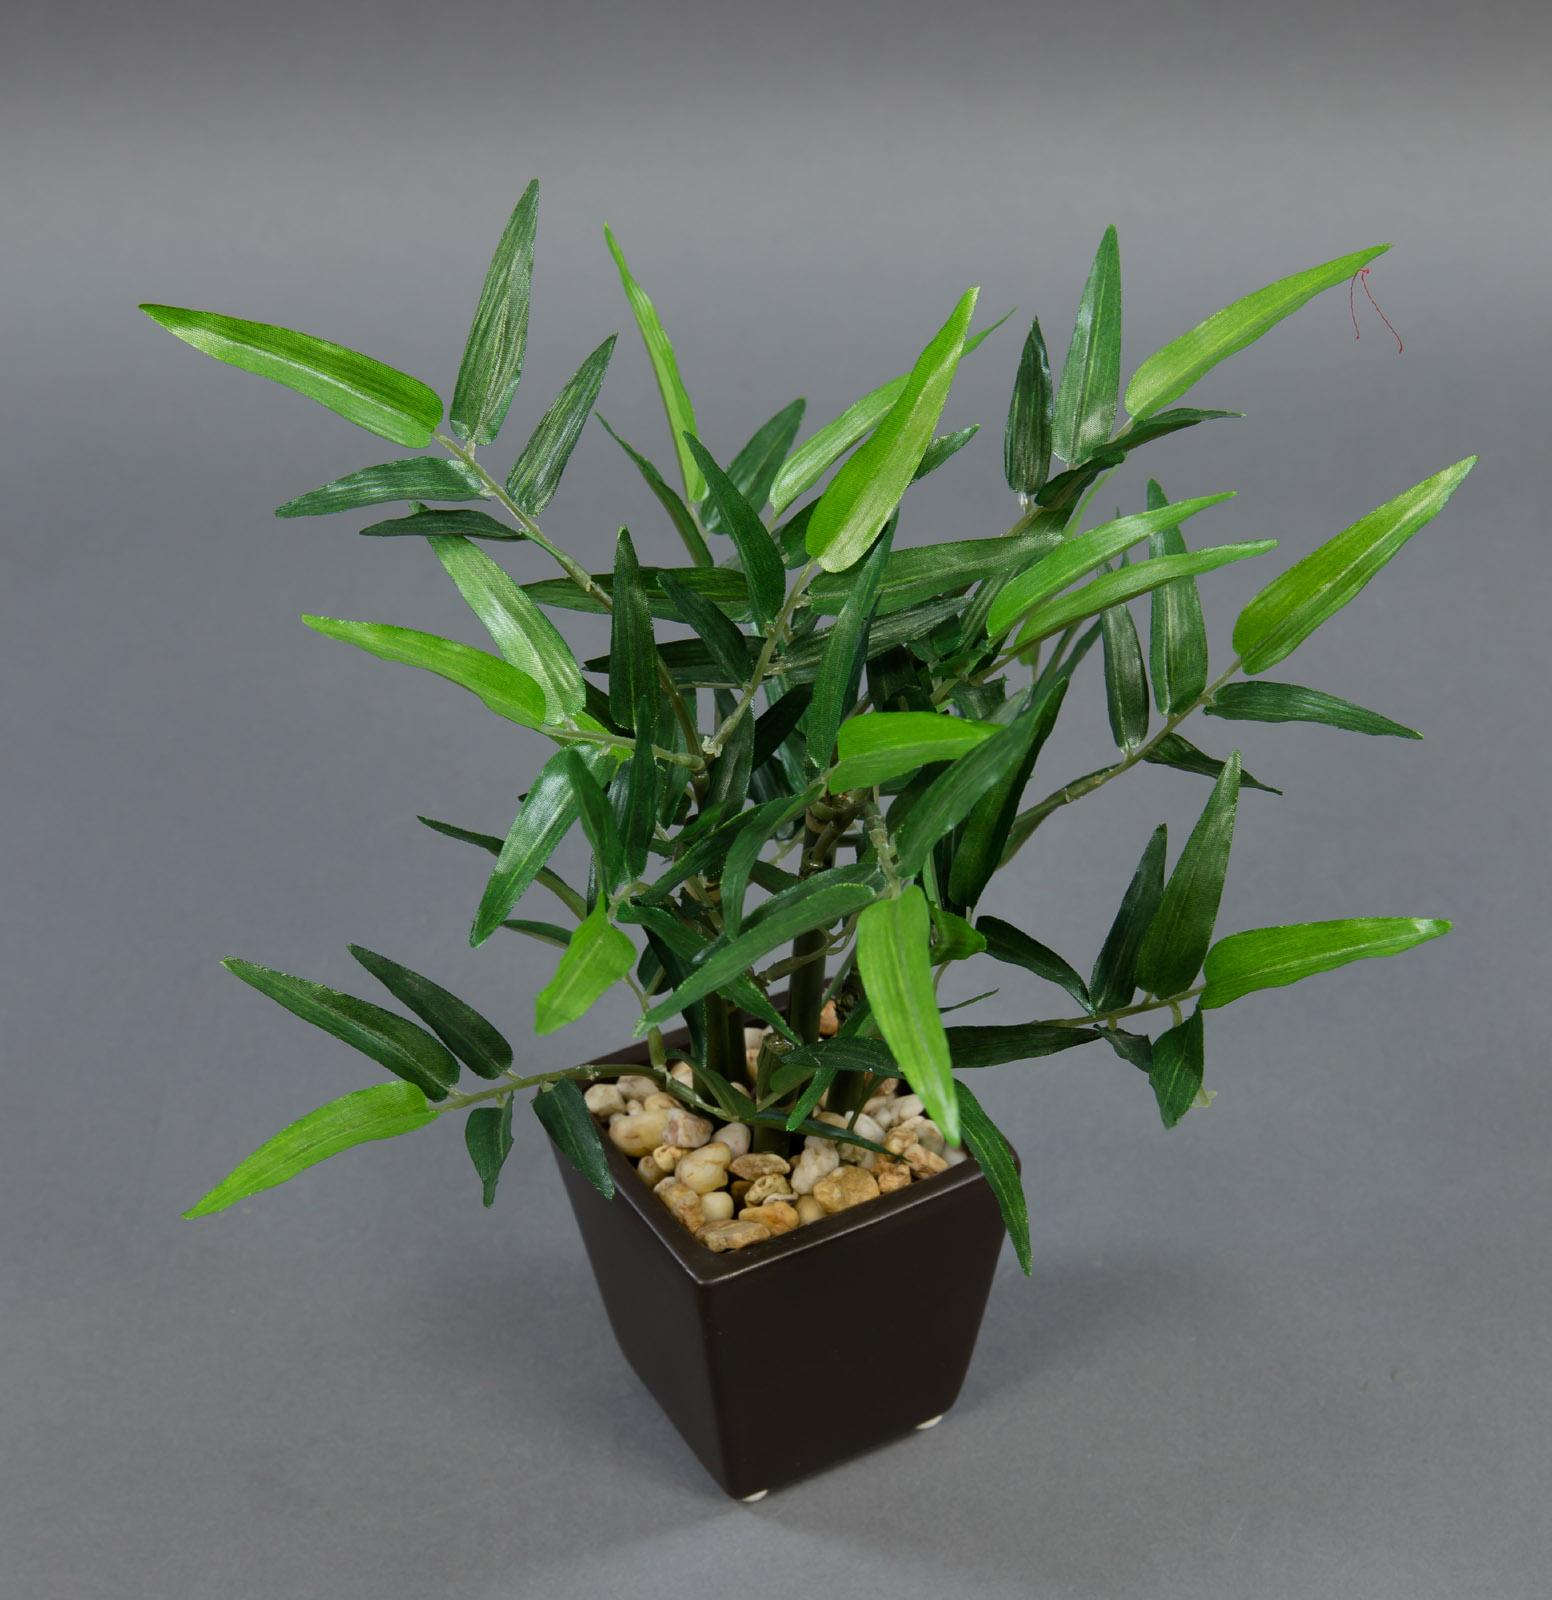 bambus 26cm im keramiktopf pf k nstlicher baum kunstpflanzen kunstbambus ebay. Black Bedroom Furniture Sets. Home Design Ideas